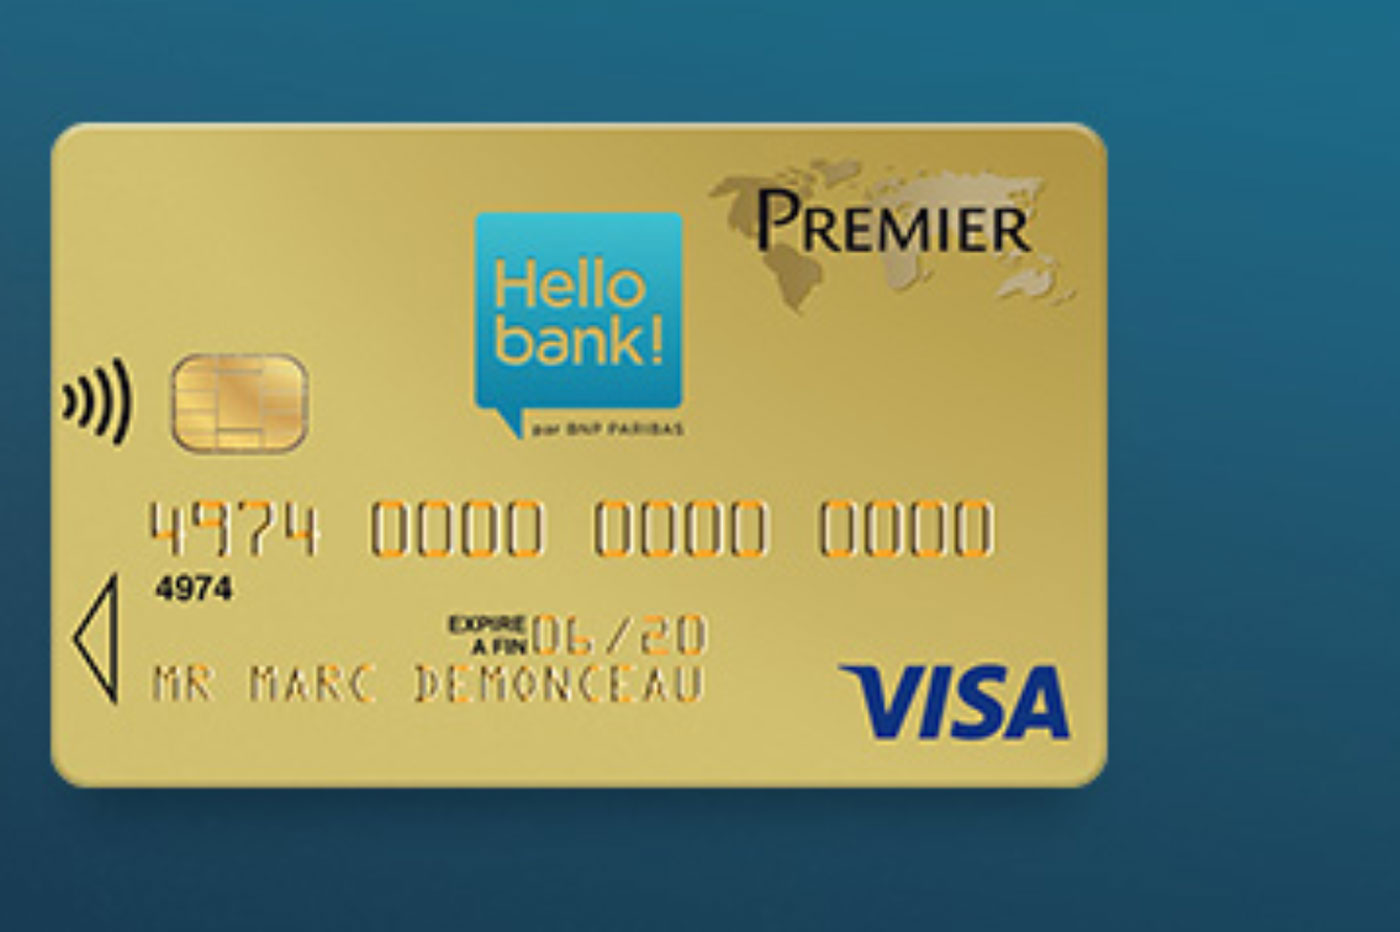 Carte Visa Premier Hello bank!